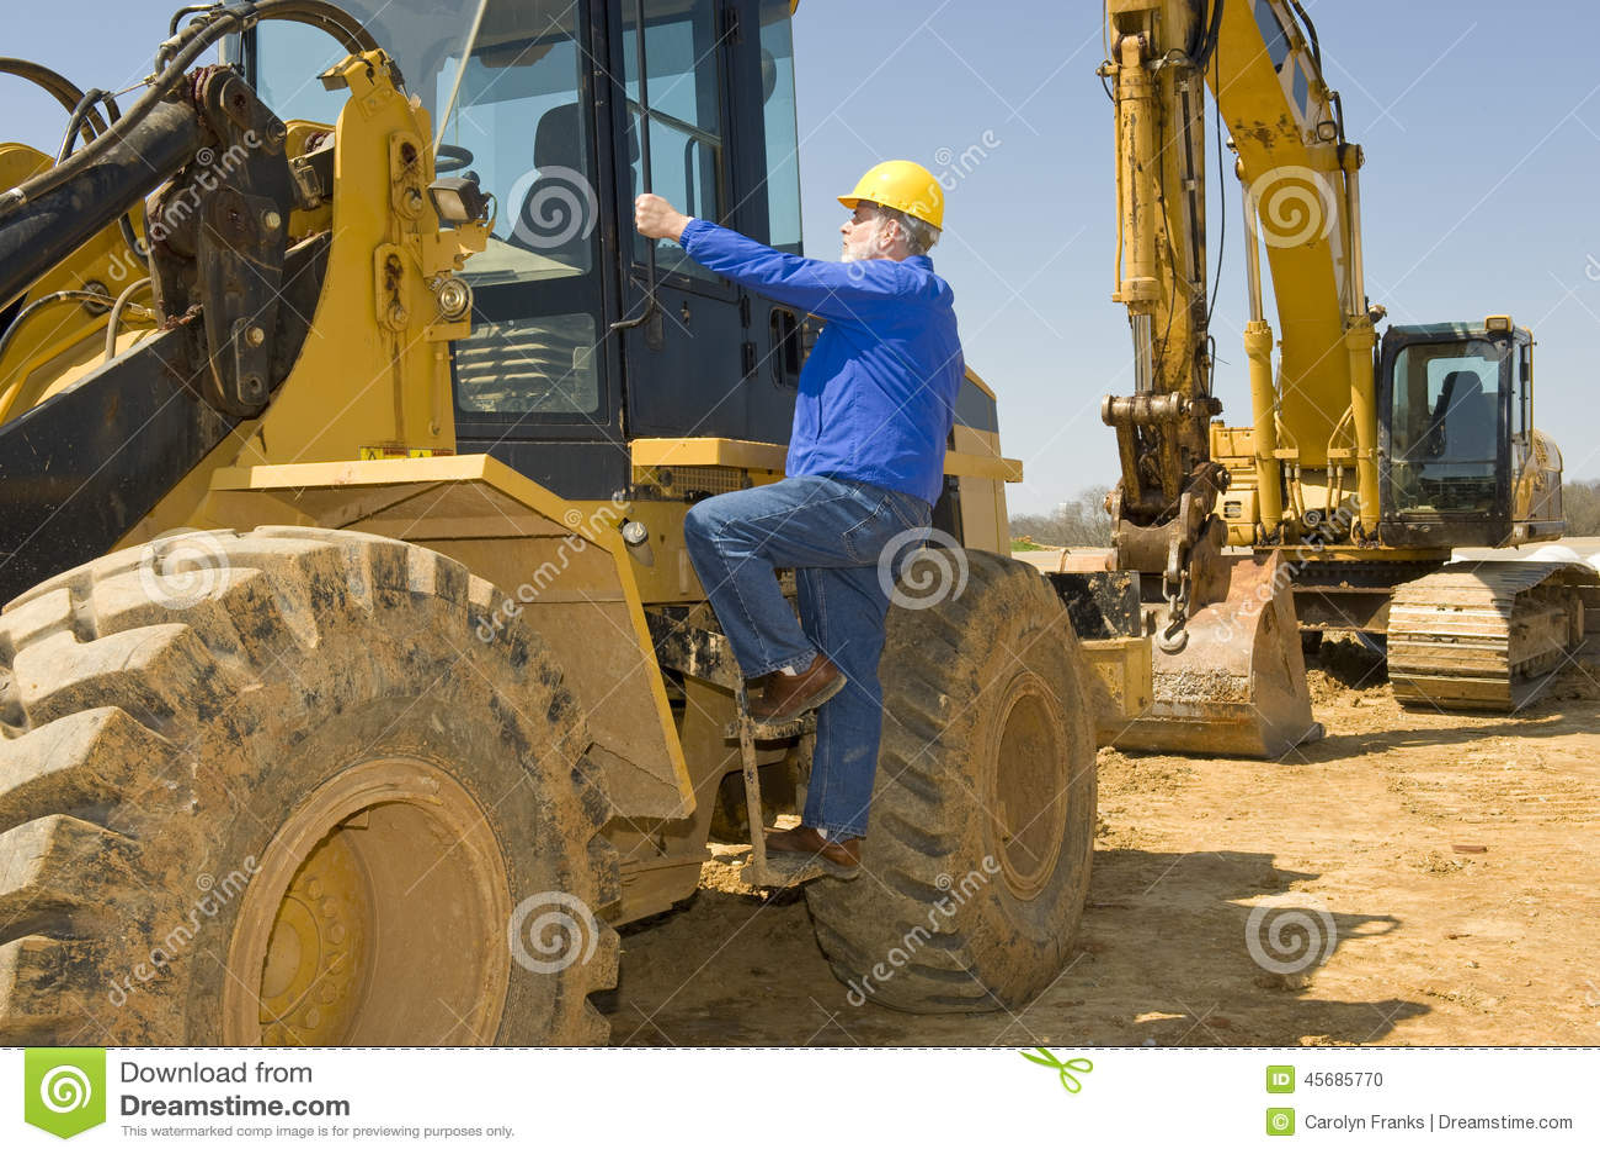 Construction Worker Climbing Heavy Equipment